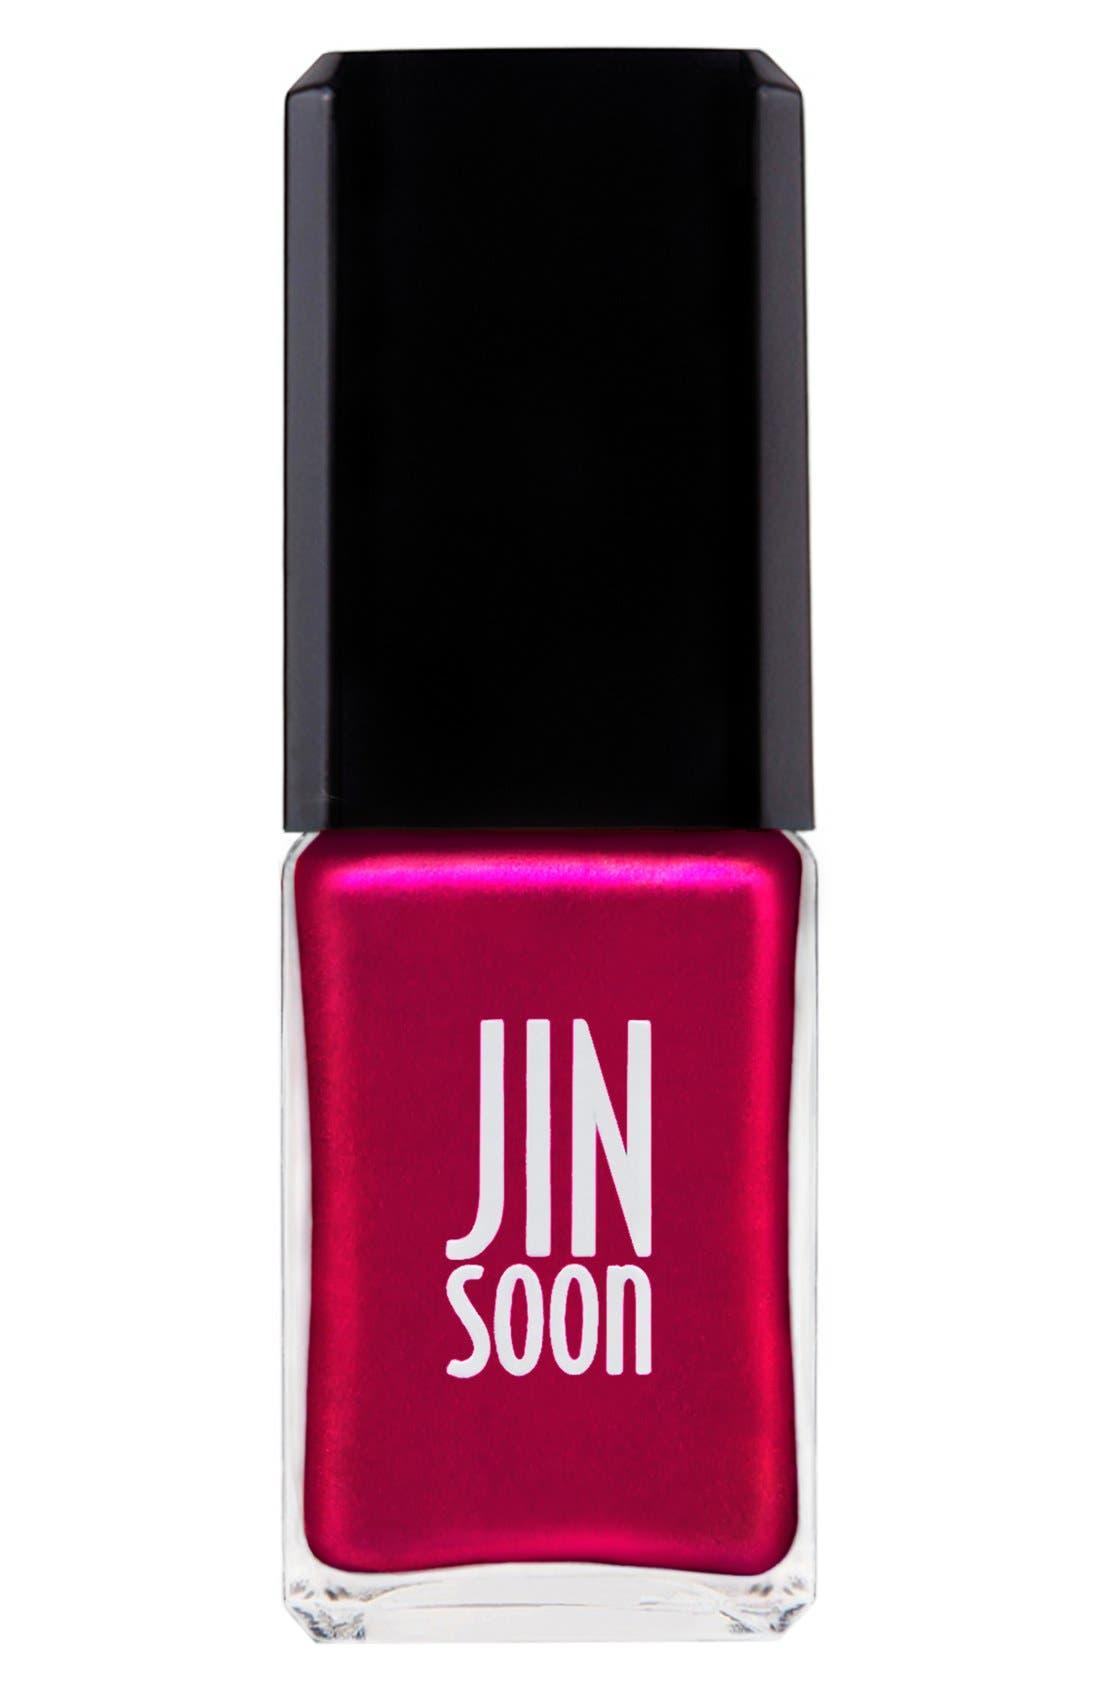 JINsoon 'Aria' Nail Lacquer